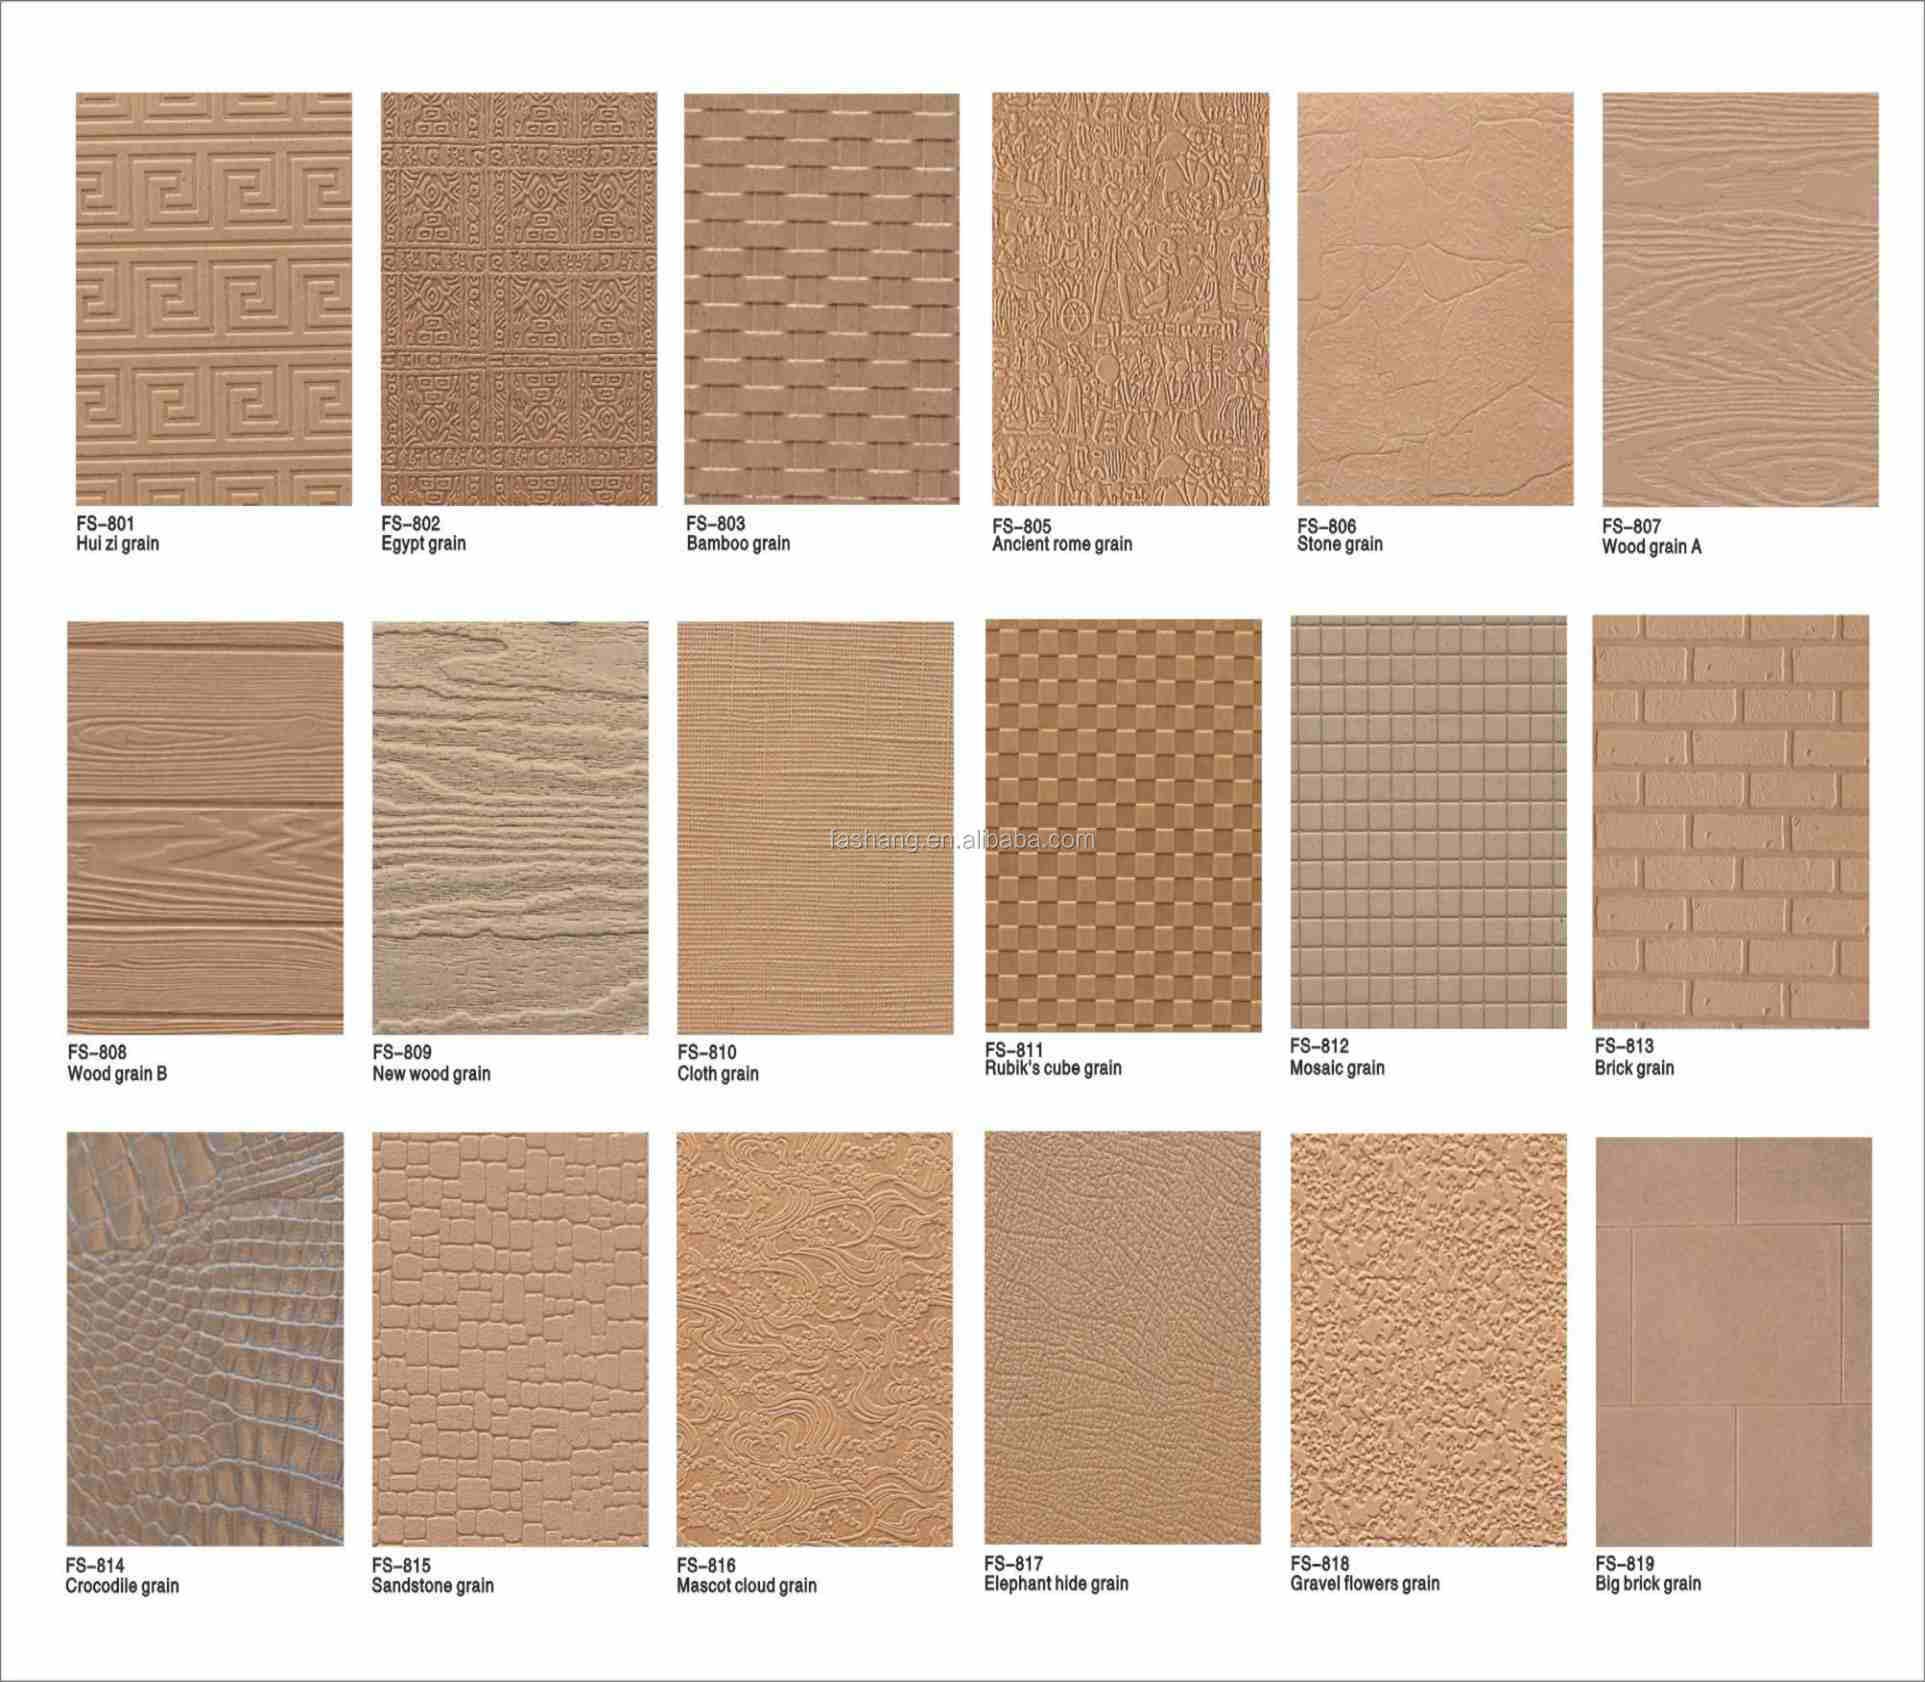 12202440mm fs813 4x8 commercial bathroom wall panels